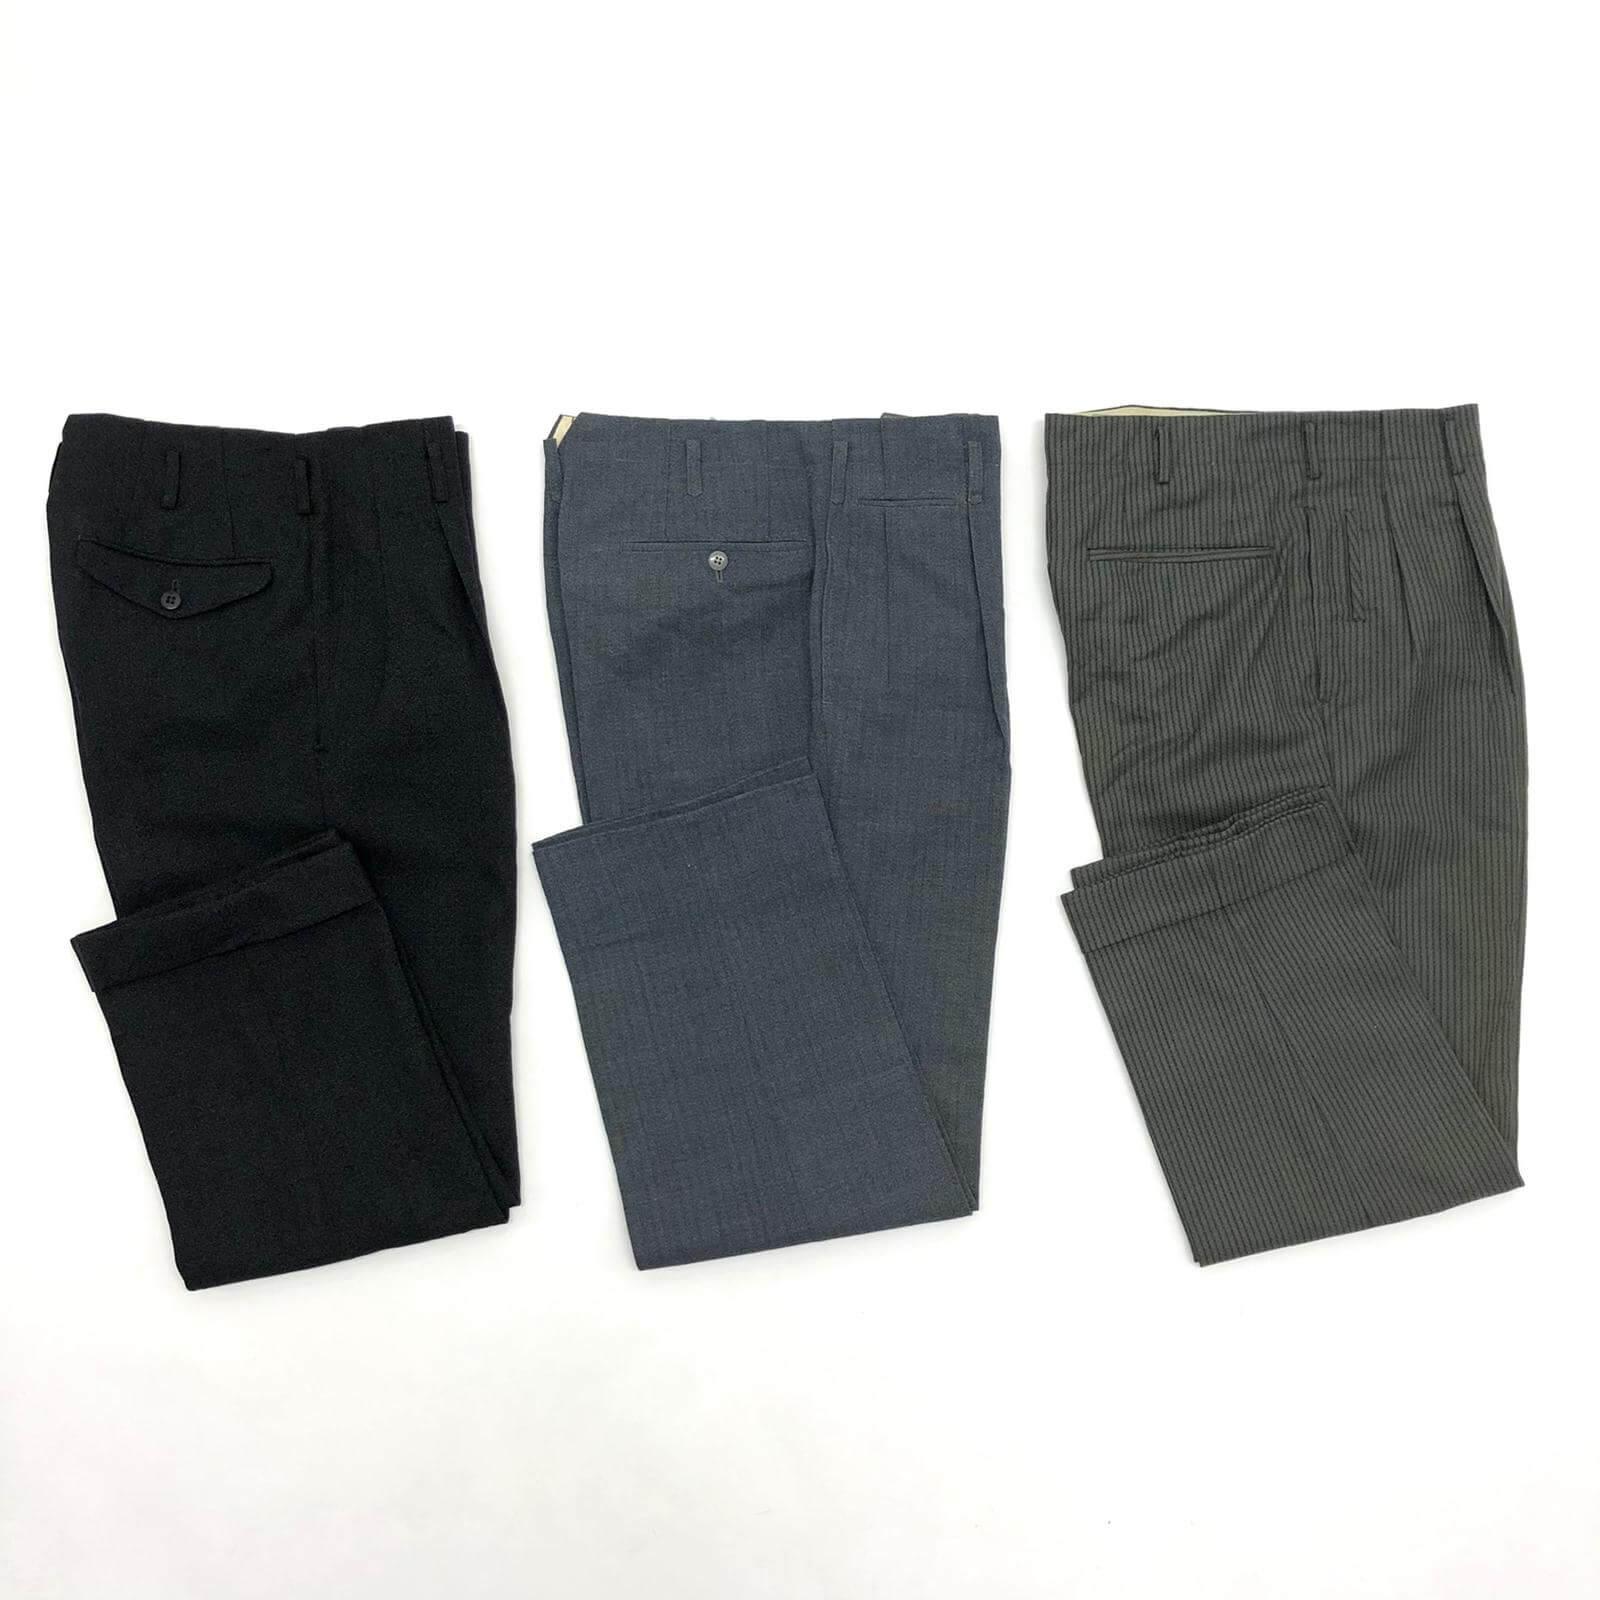 Vintage 1930's Trousers